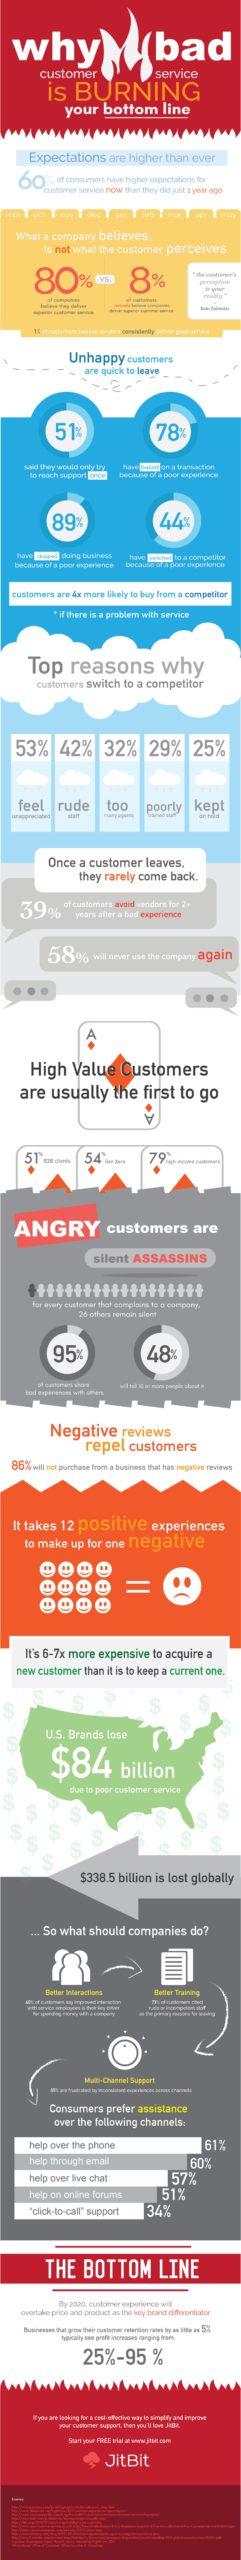 bad-customer-service-infographic